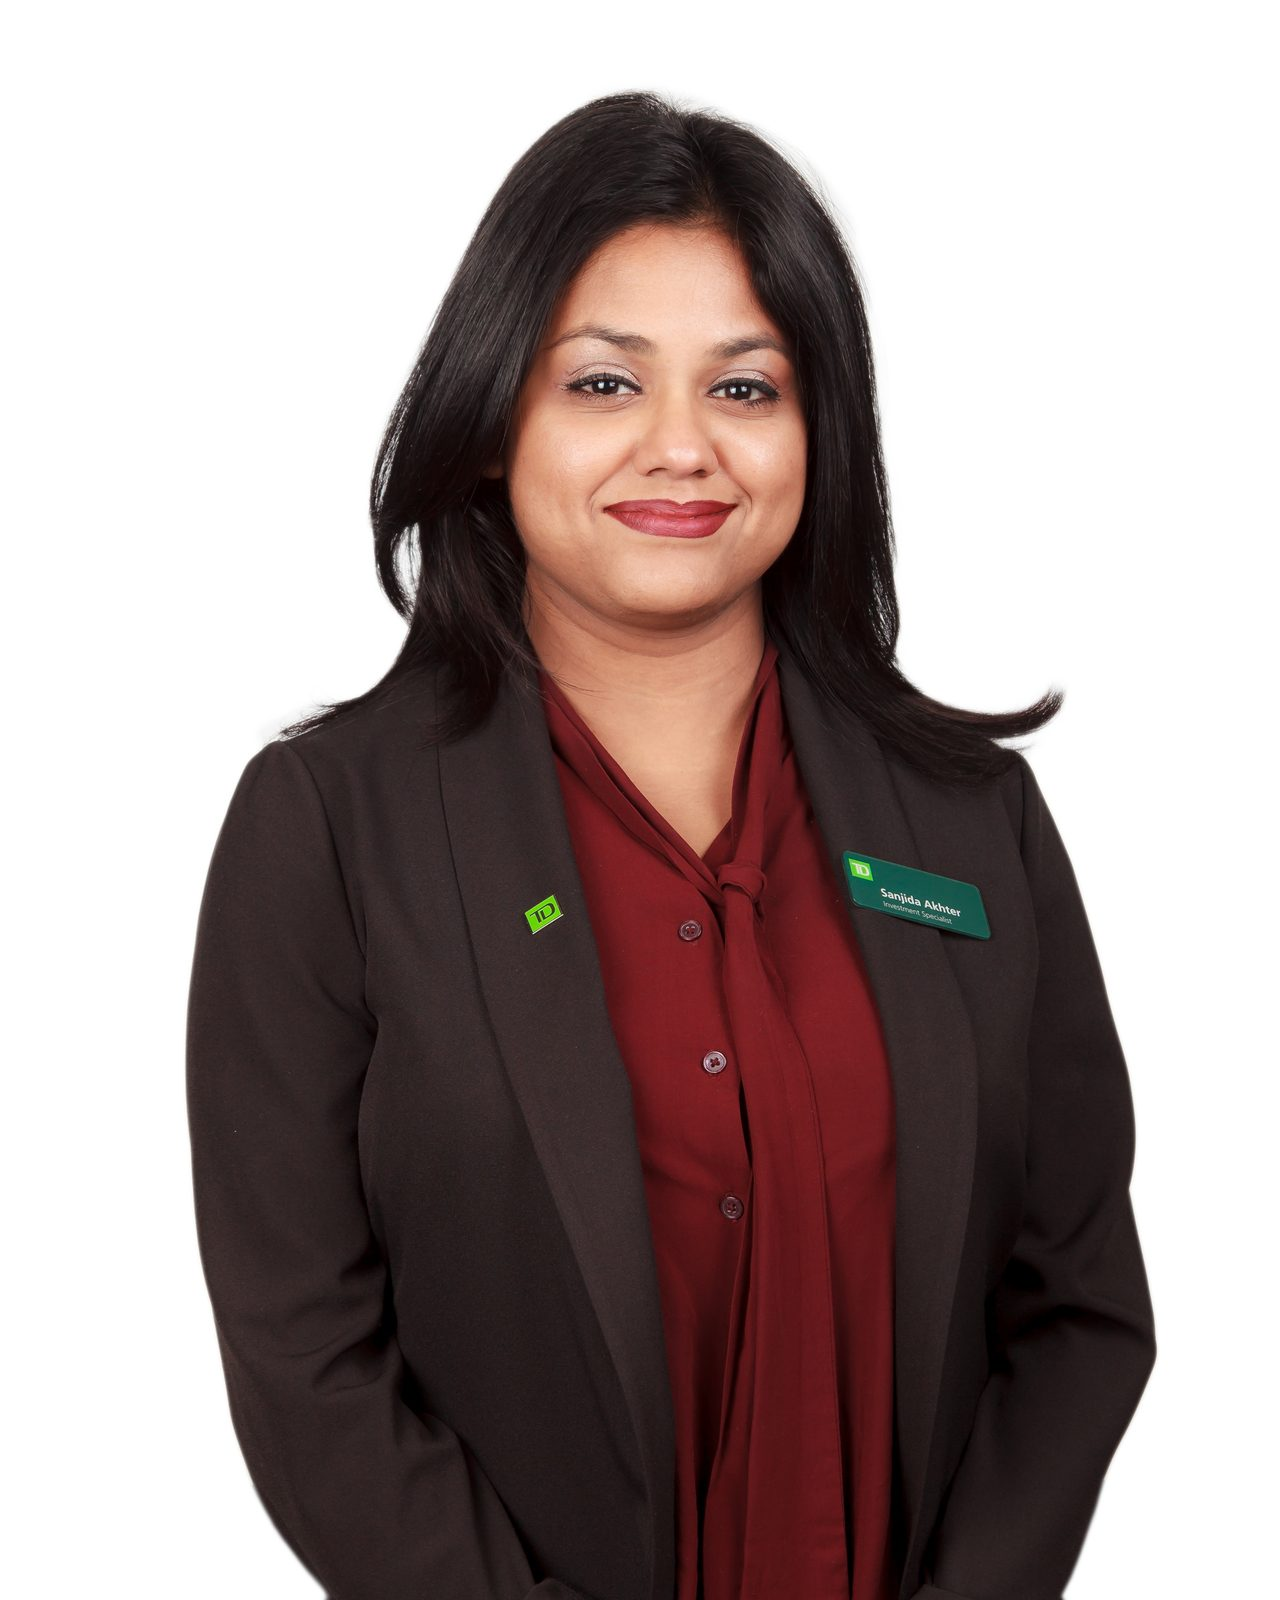 Sanjida Akhter - TD Investment Specialist